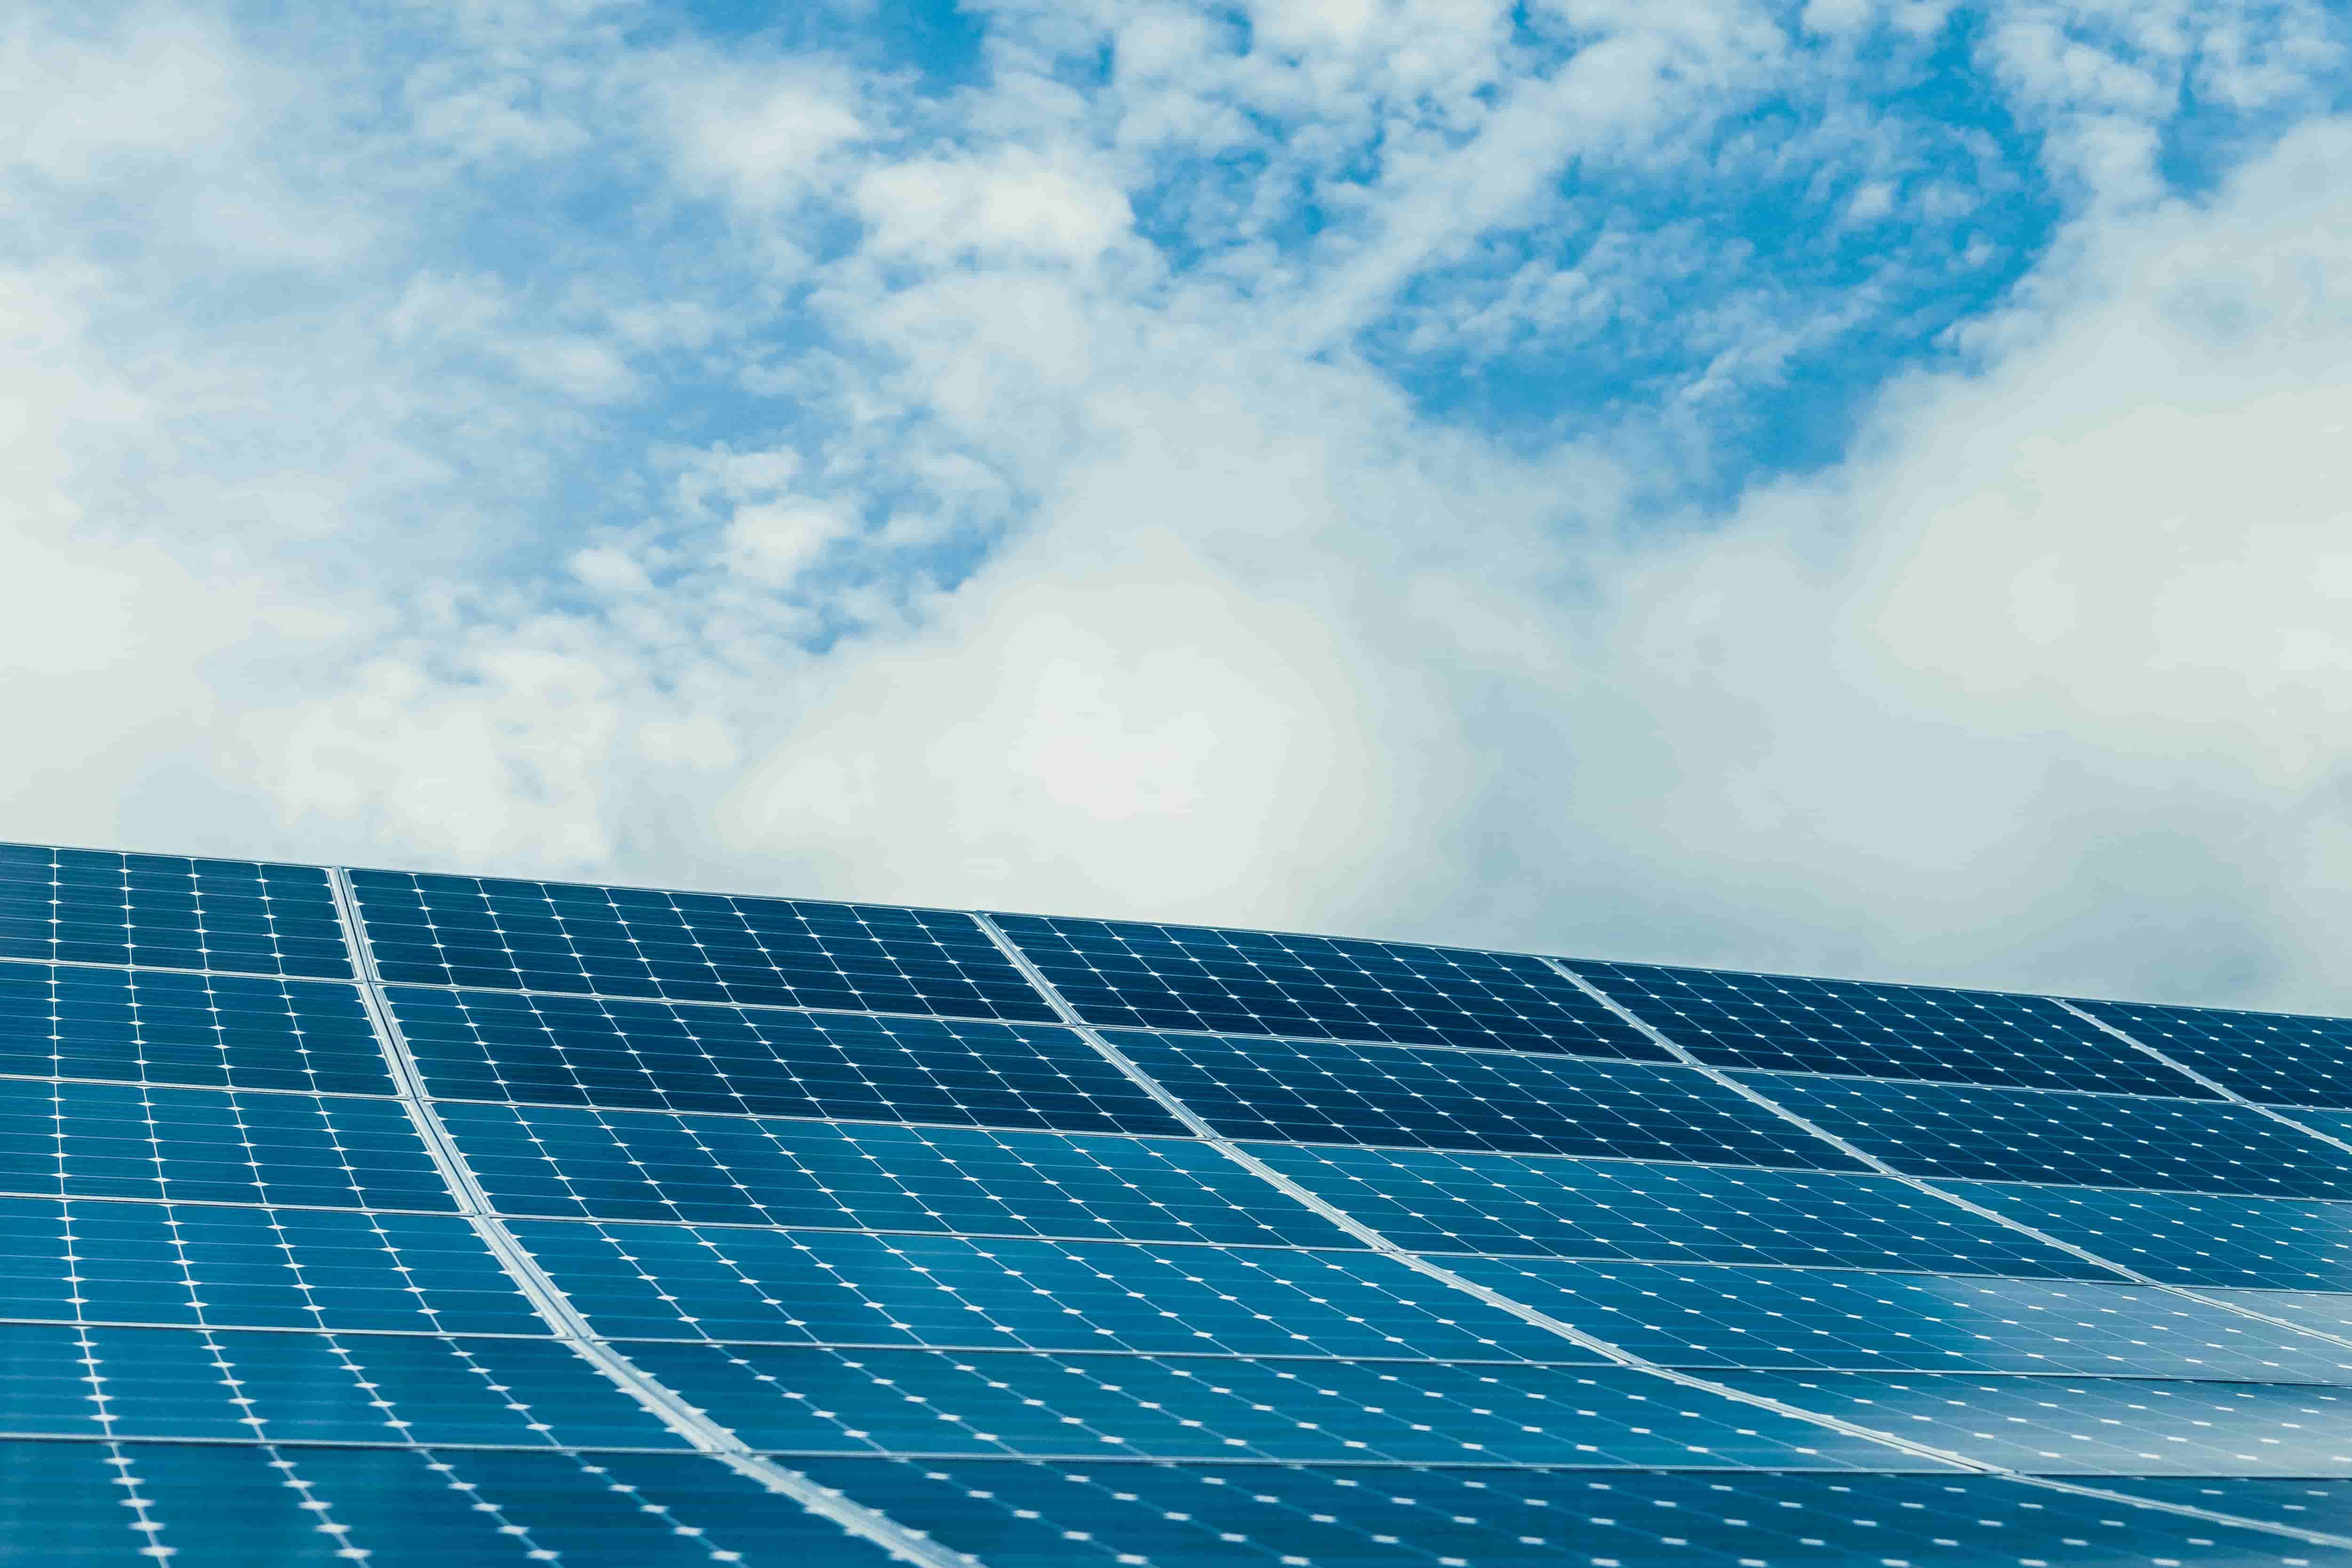 Different types of solar panels: monocrystalline and polycrystalline